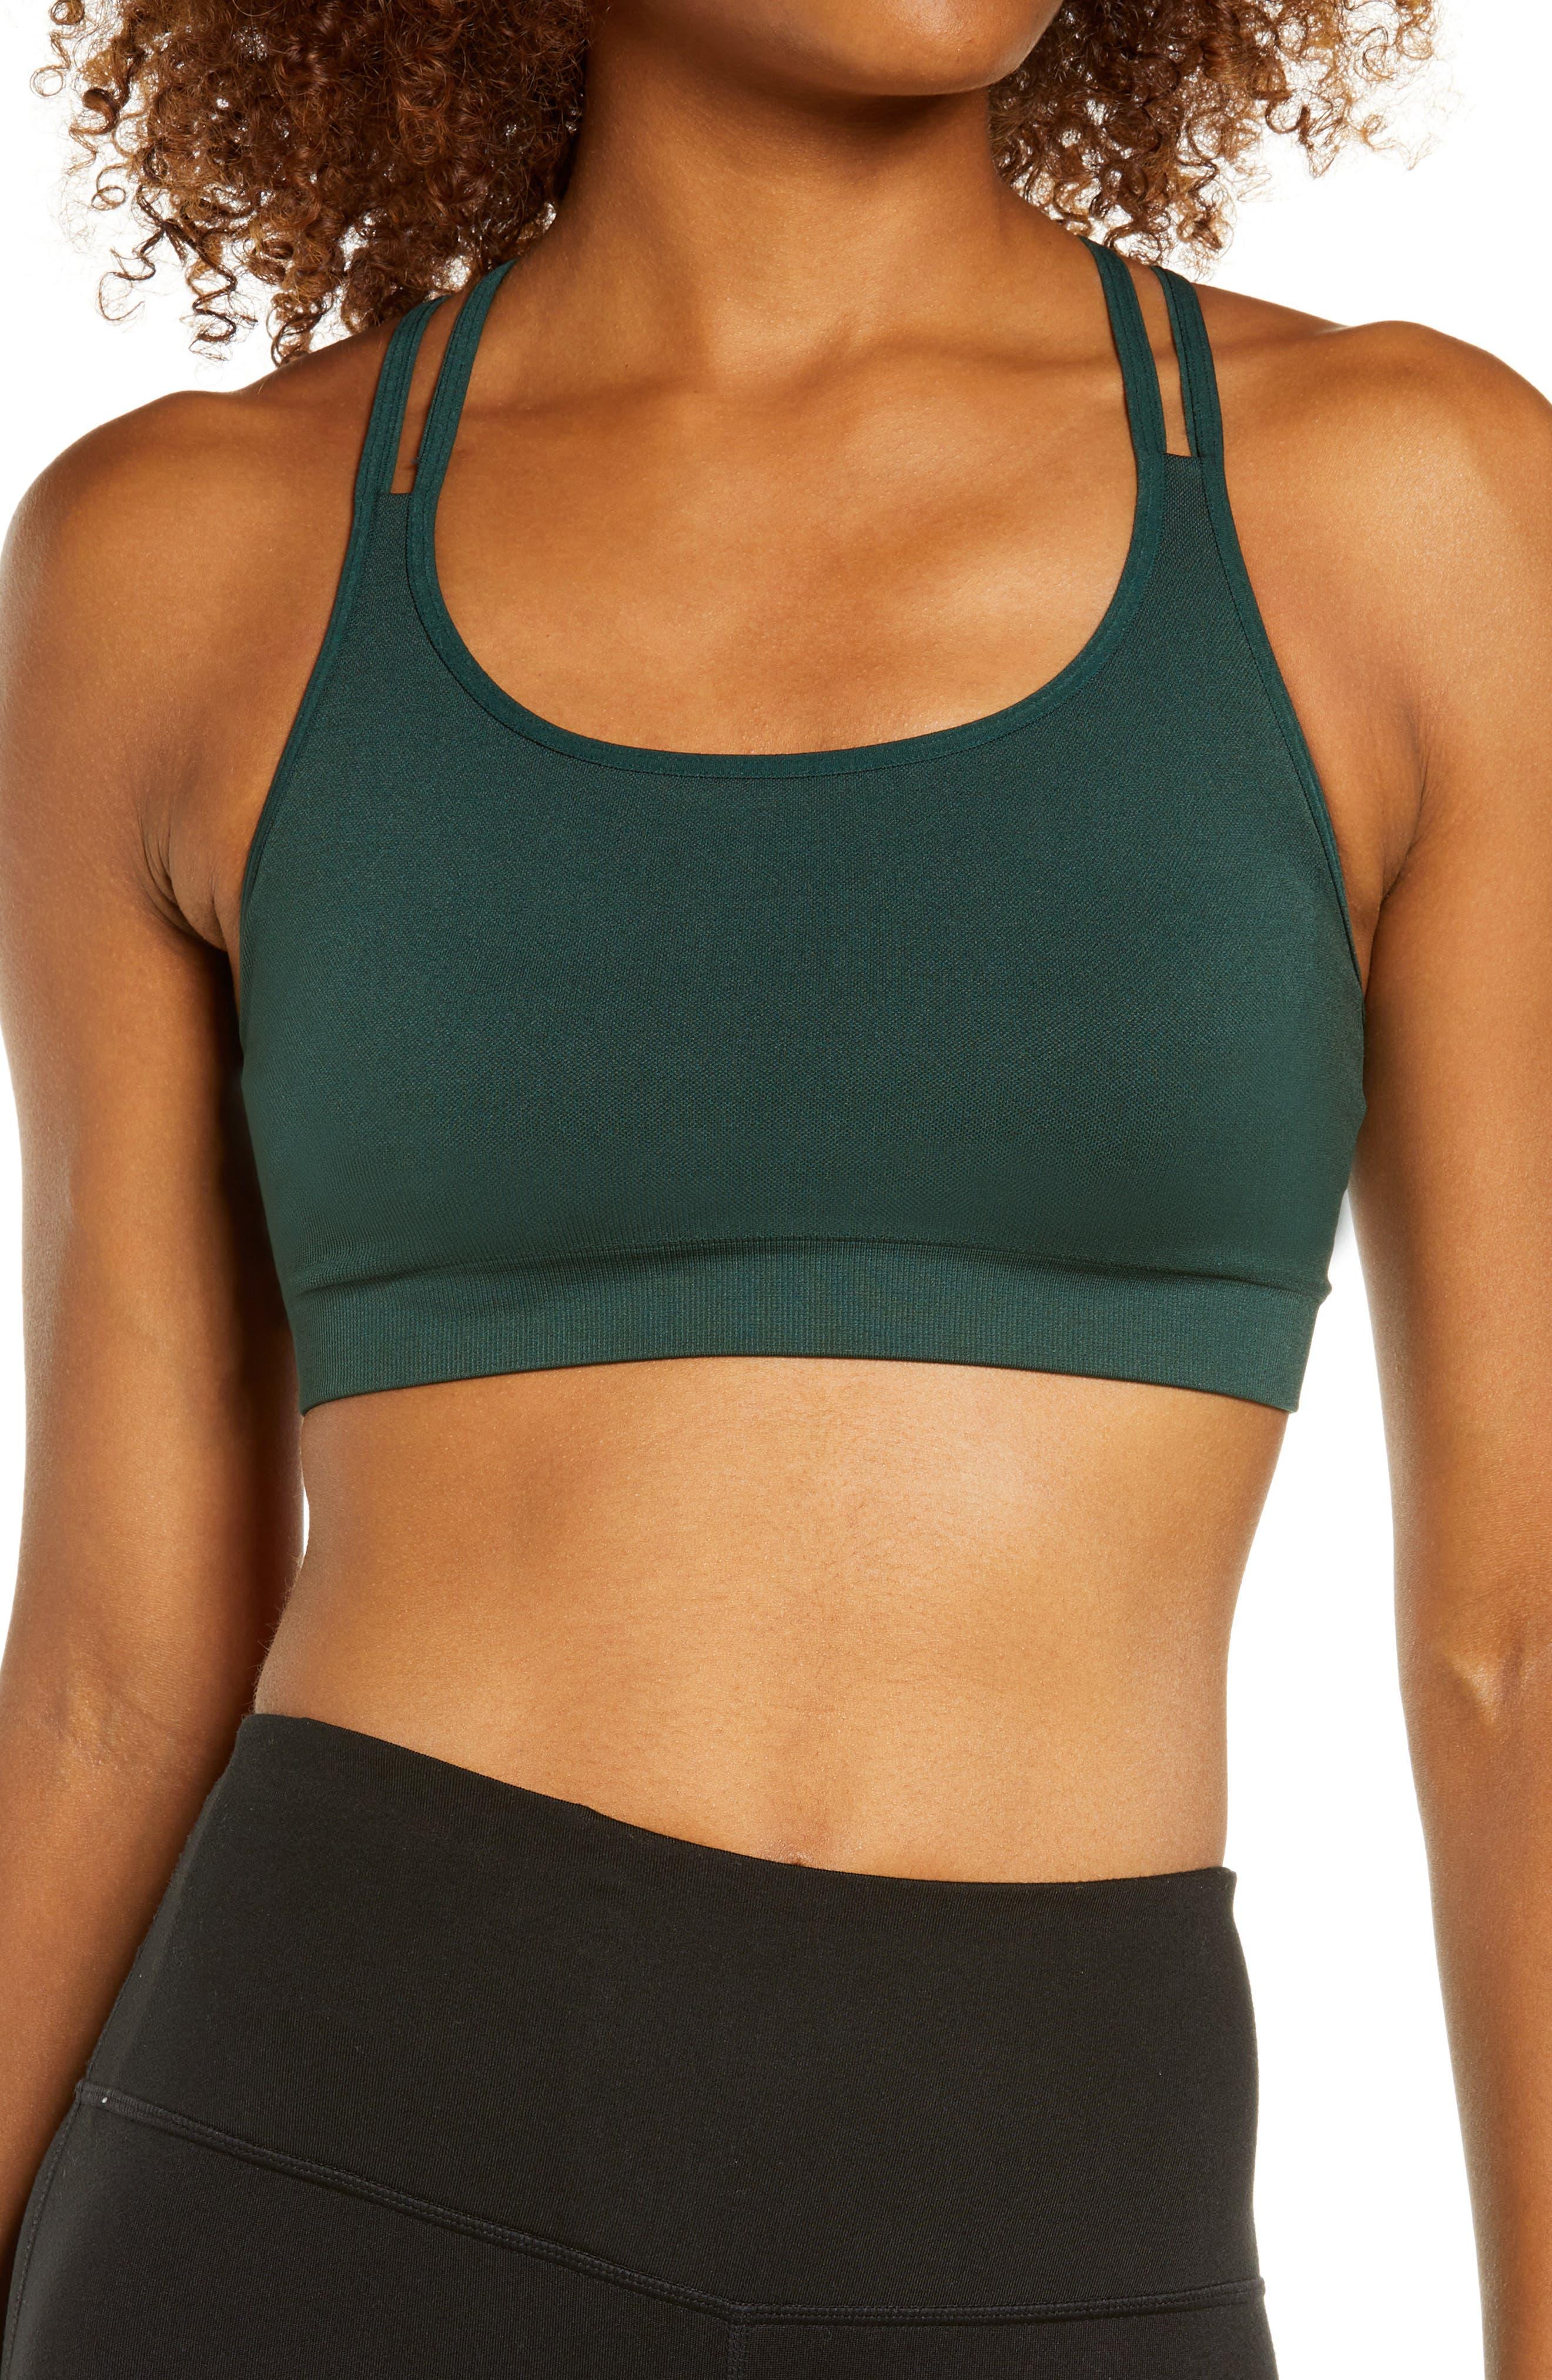 MiaoC Longline Sports Bras for Women Sleeveless Casual Vest Chest Pad Seamless Fitness Movement Short Yoga Tank Tops